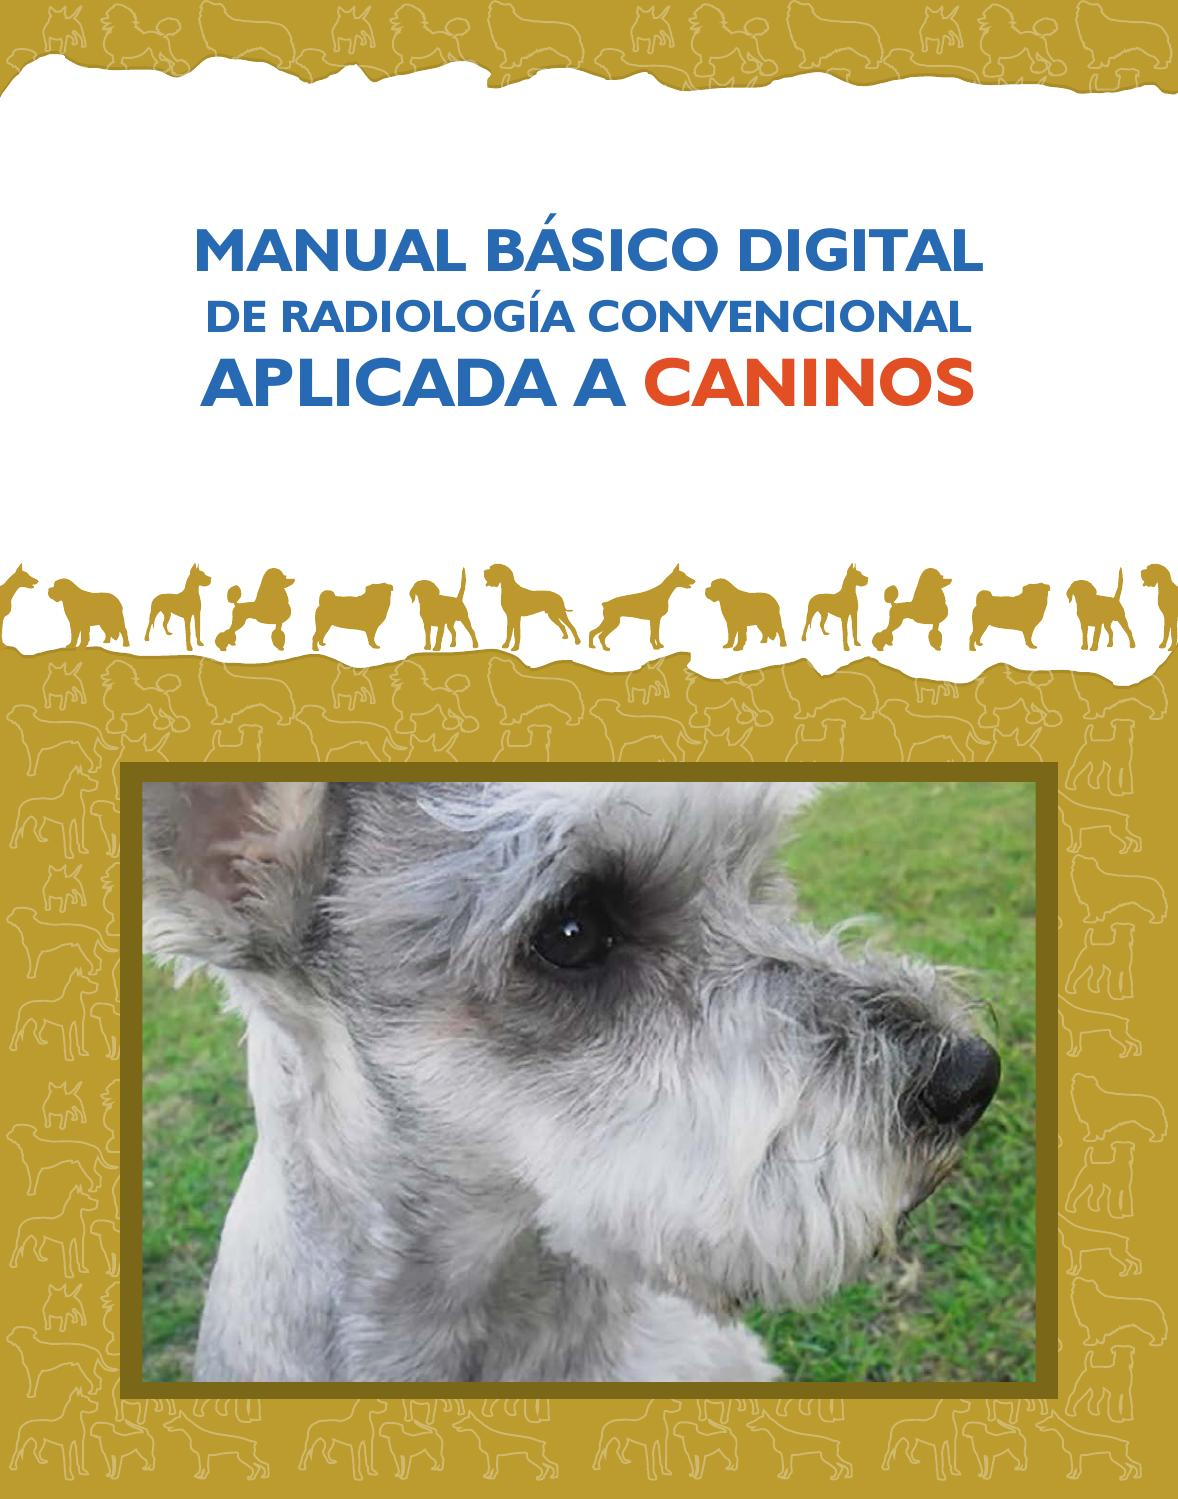 Manual Básico Digital de Radiologia Convencional Aplicada a Caninos ...